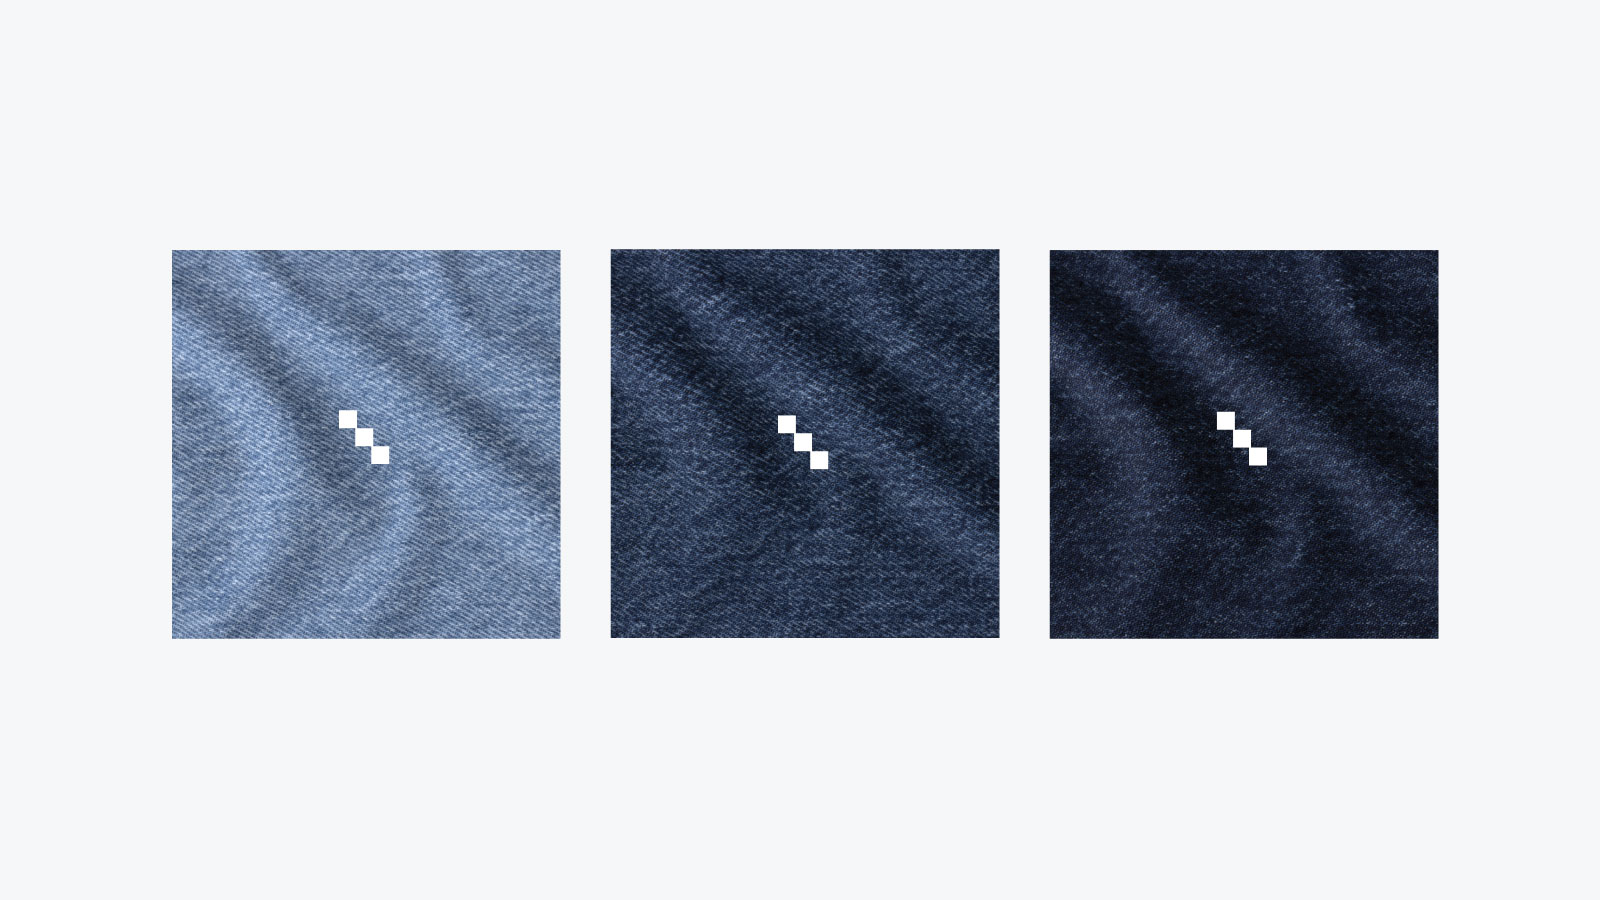 INDIKON logomark on three denim fabrics with different shades